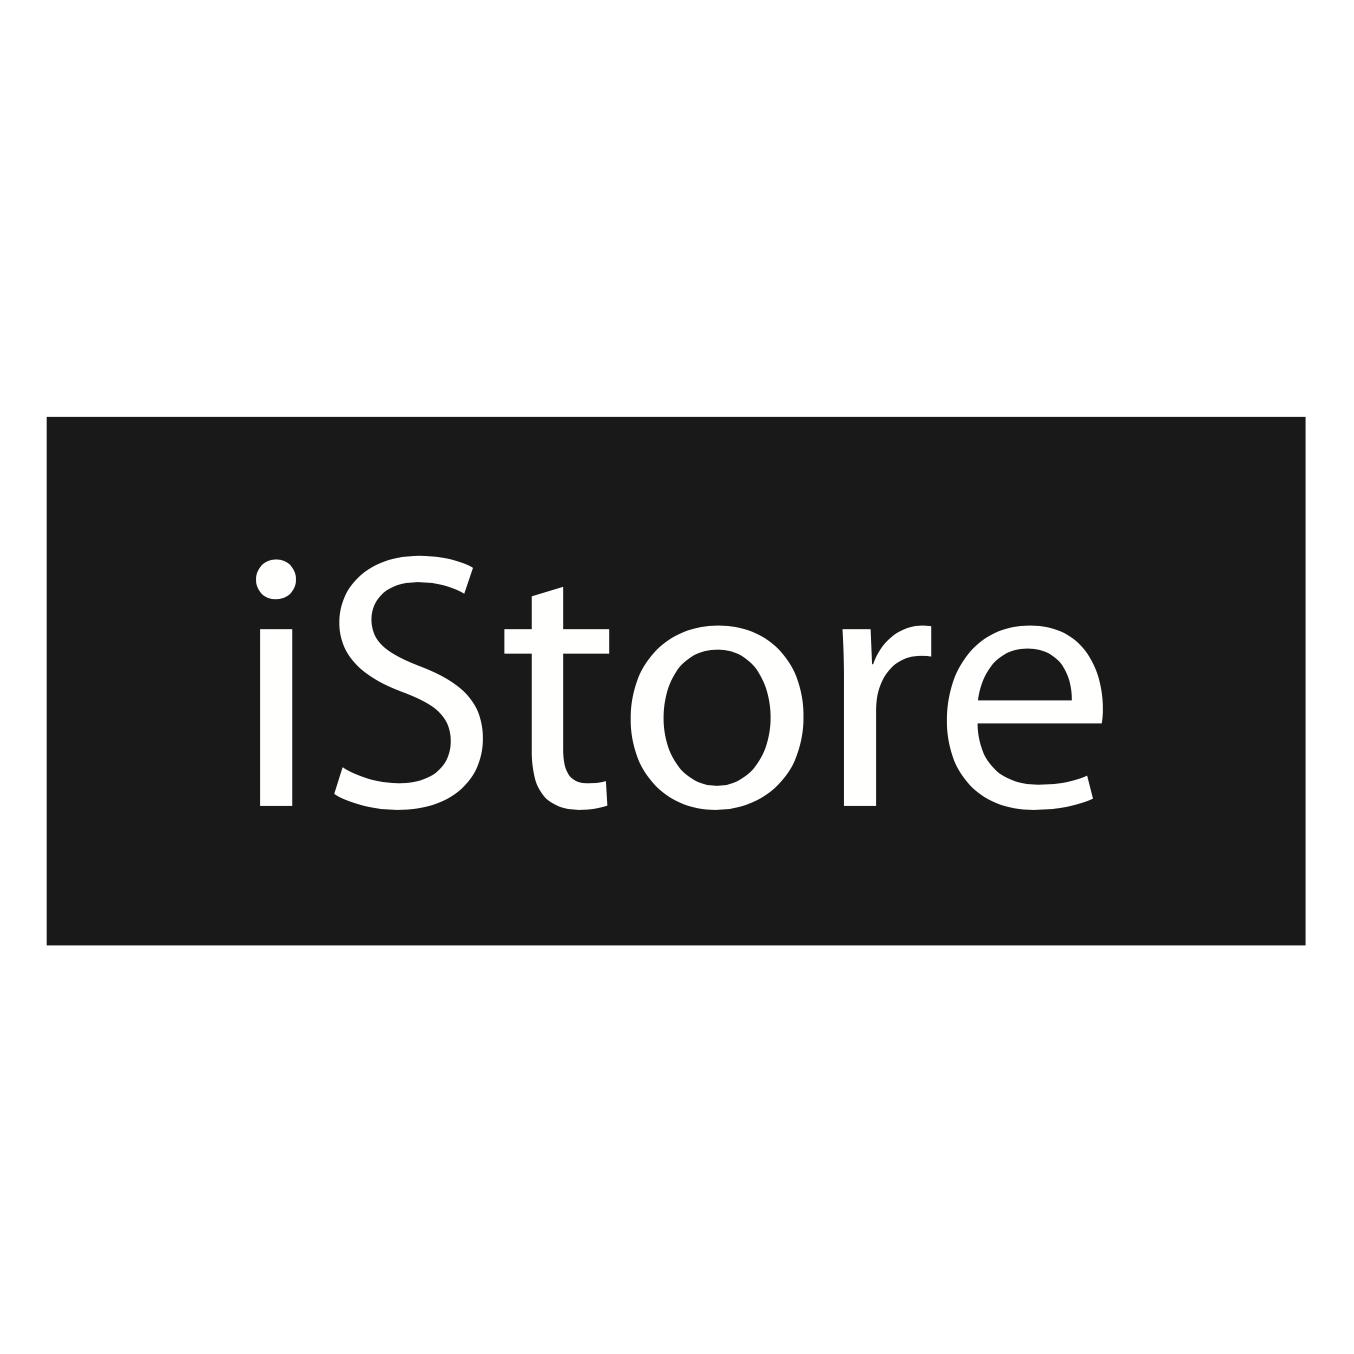 Incase Hardshell Case for 13-inch MacBook Pro Thunderbolt (USB-C) Dots - Black